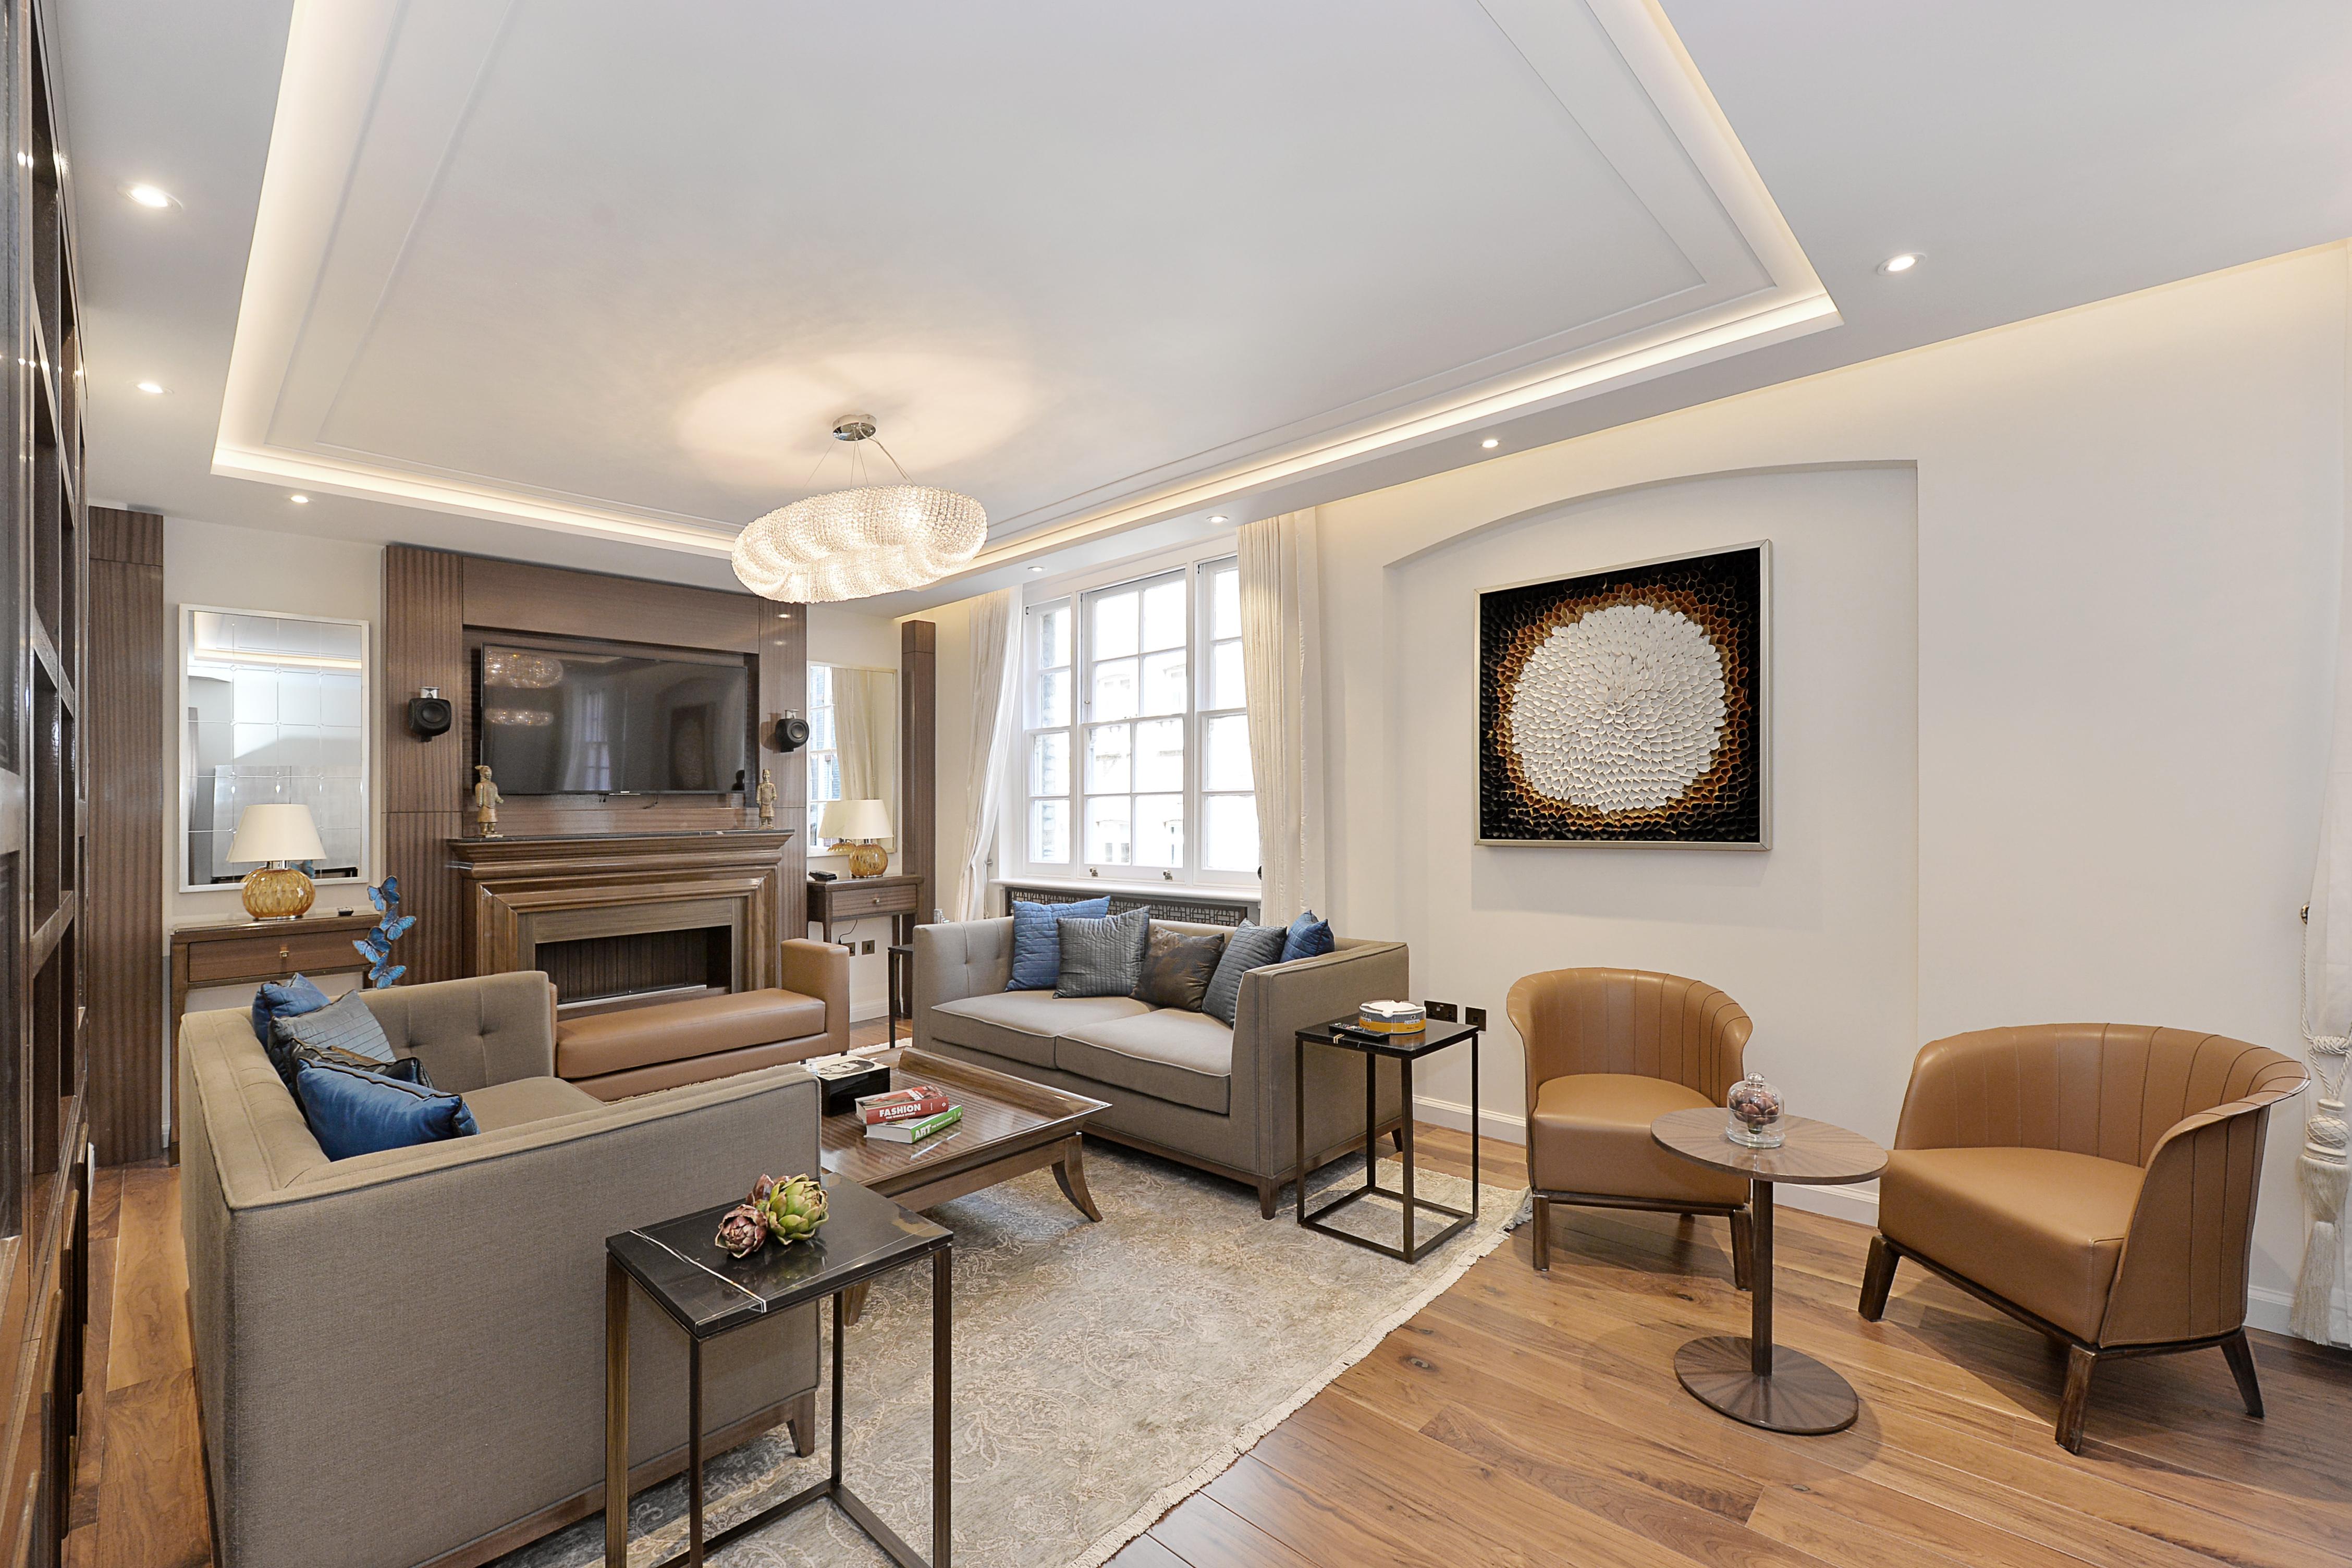 Montagu Mansions,Lounge